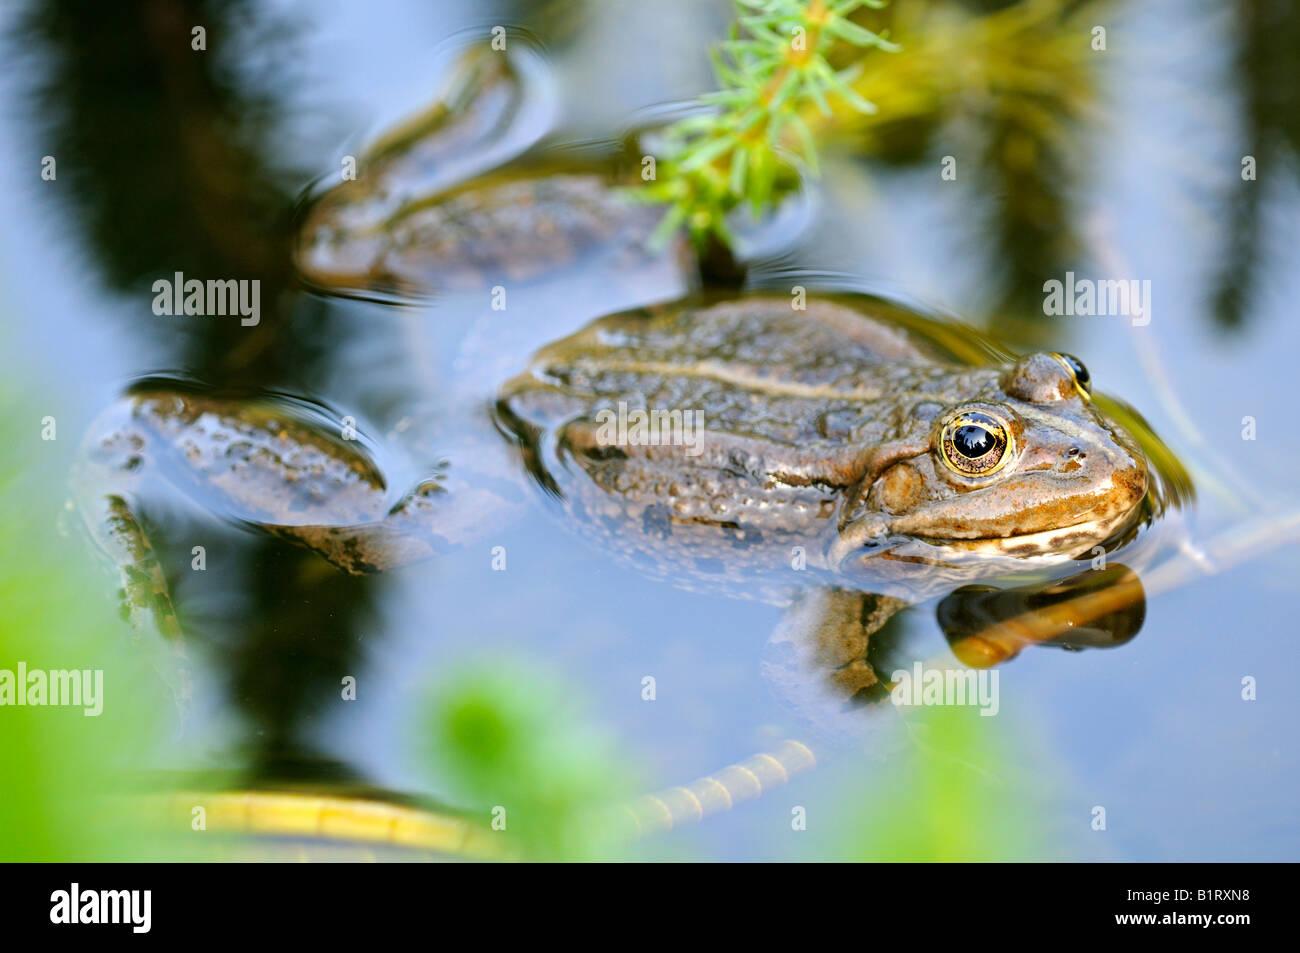 Edible Frog (Pelophylax kl. esculentus, Rana kl. esculenta) - Stock Image